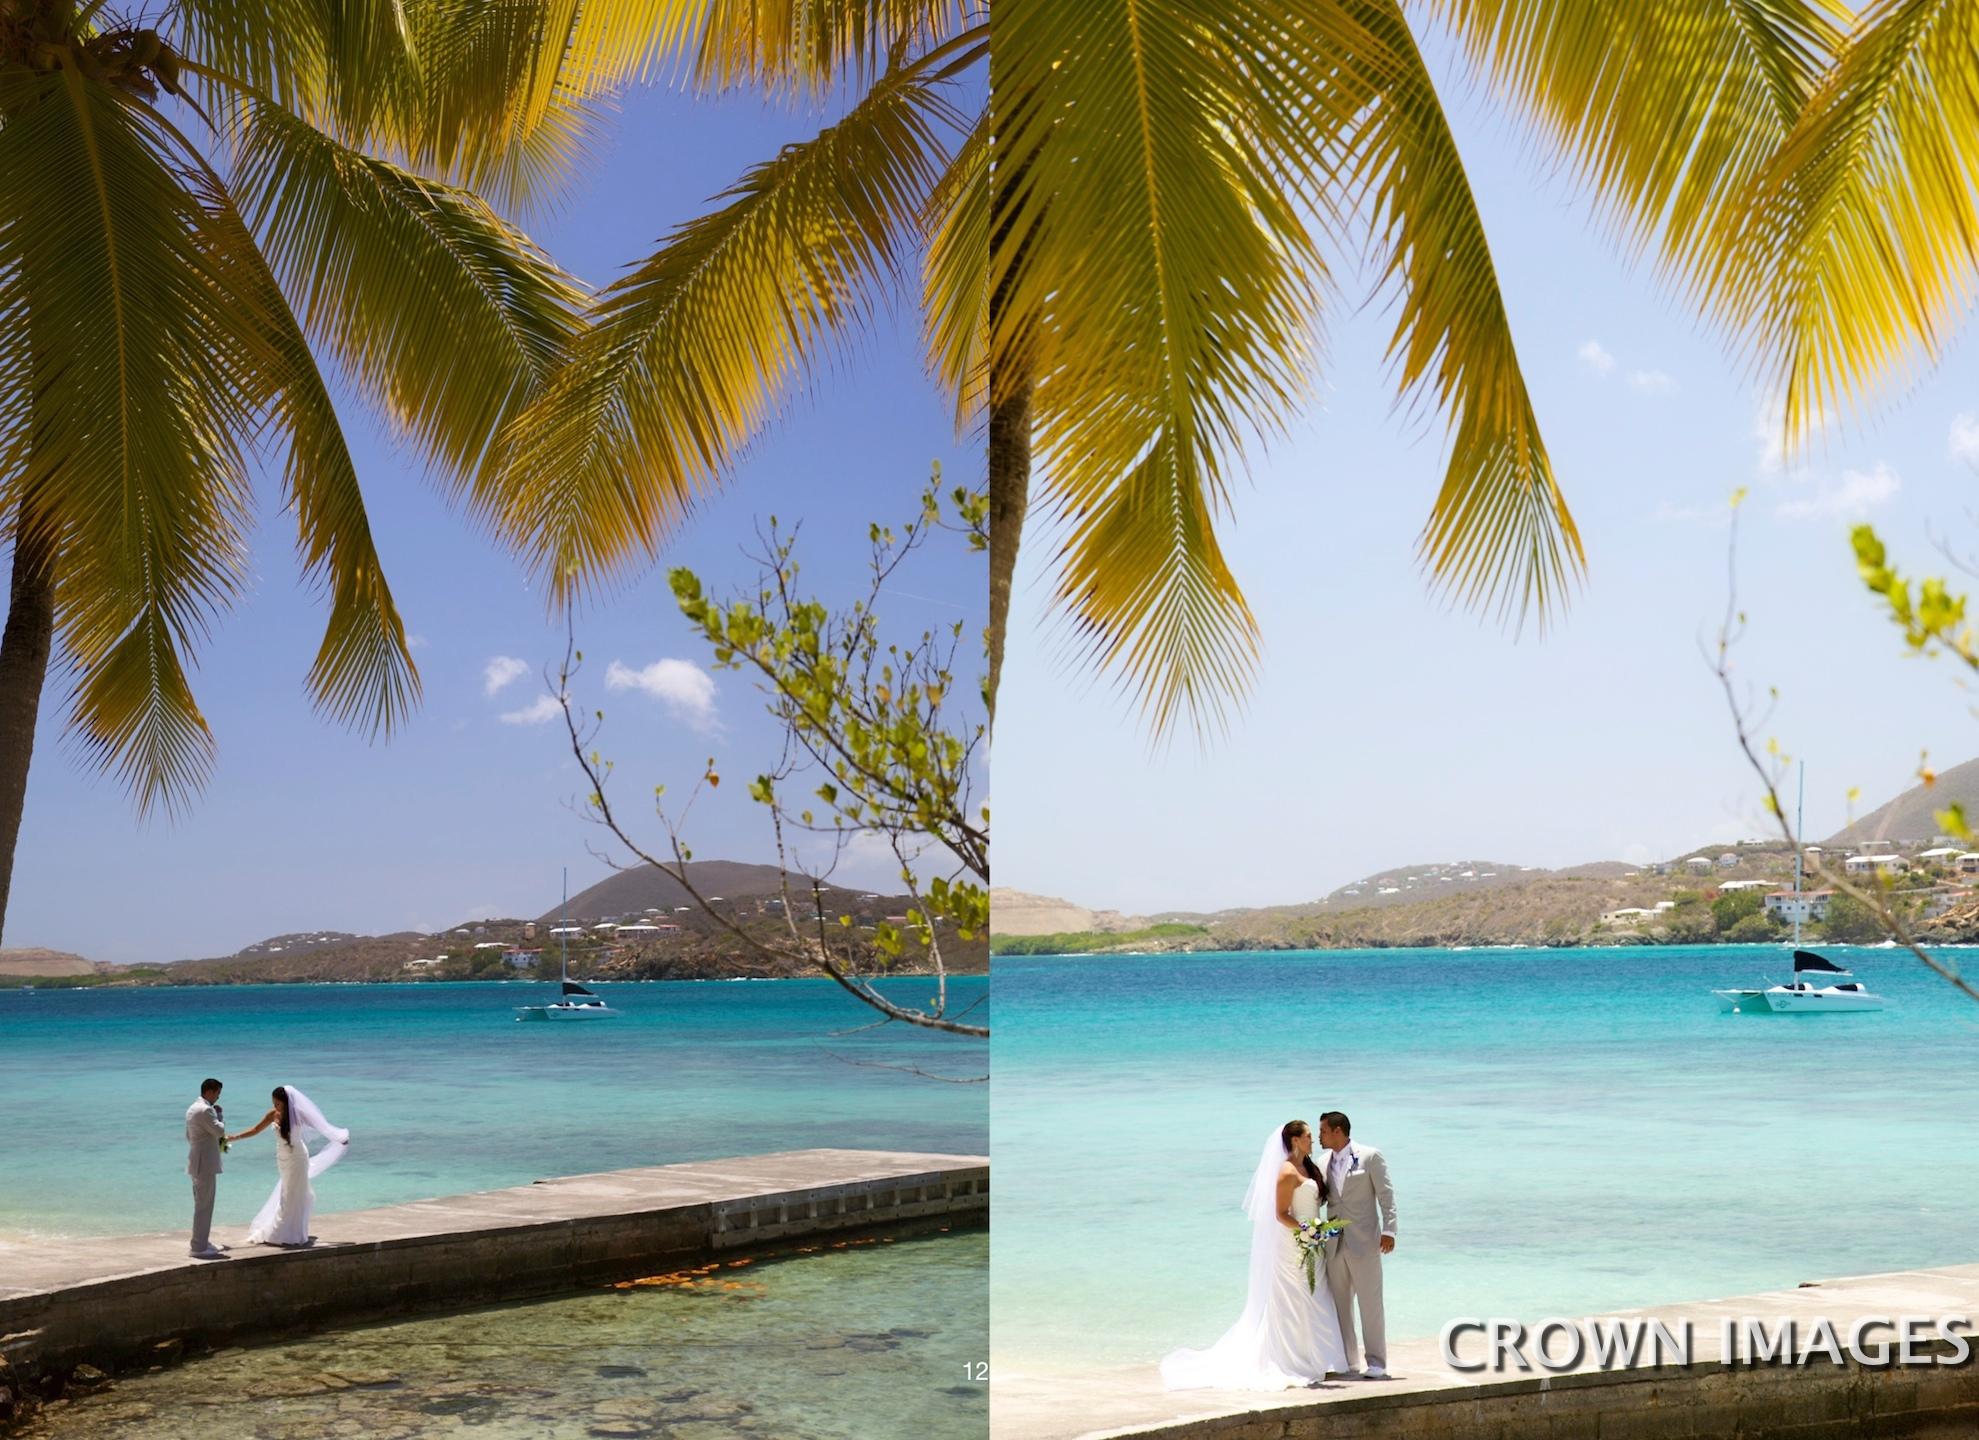 st thomas dock photos of a wedding